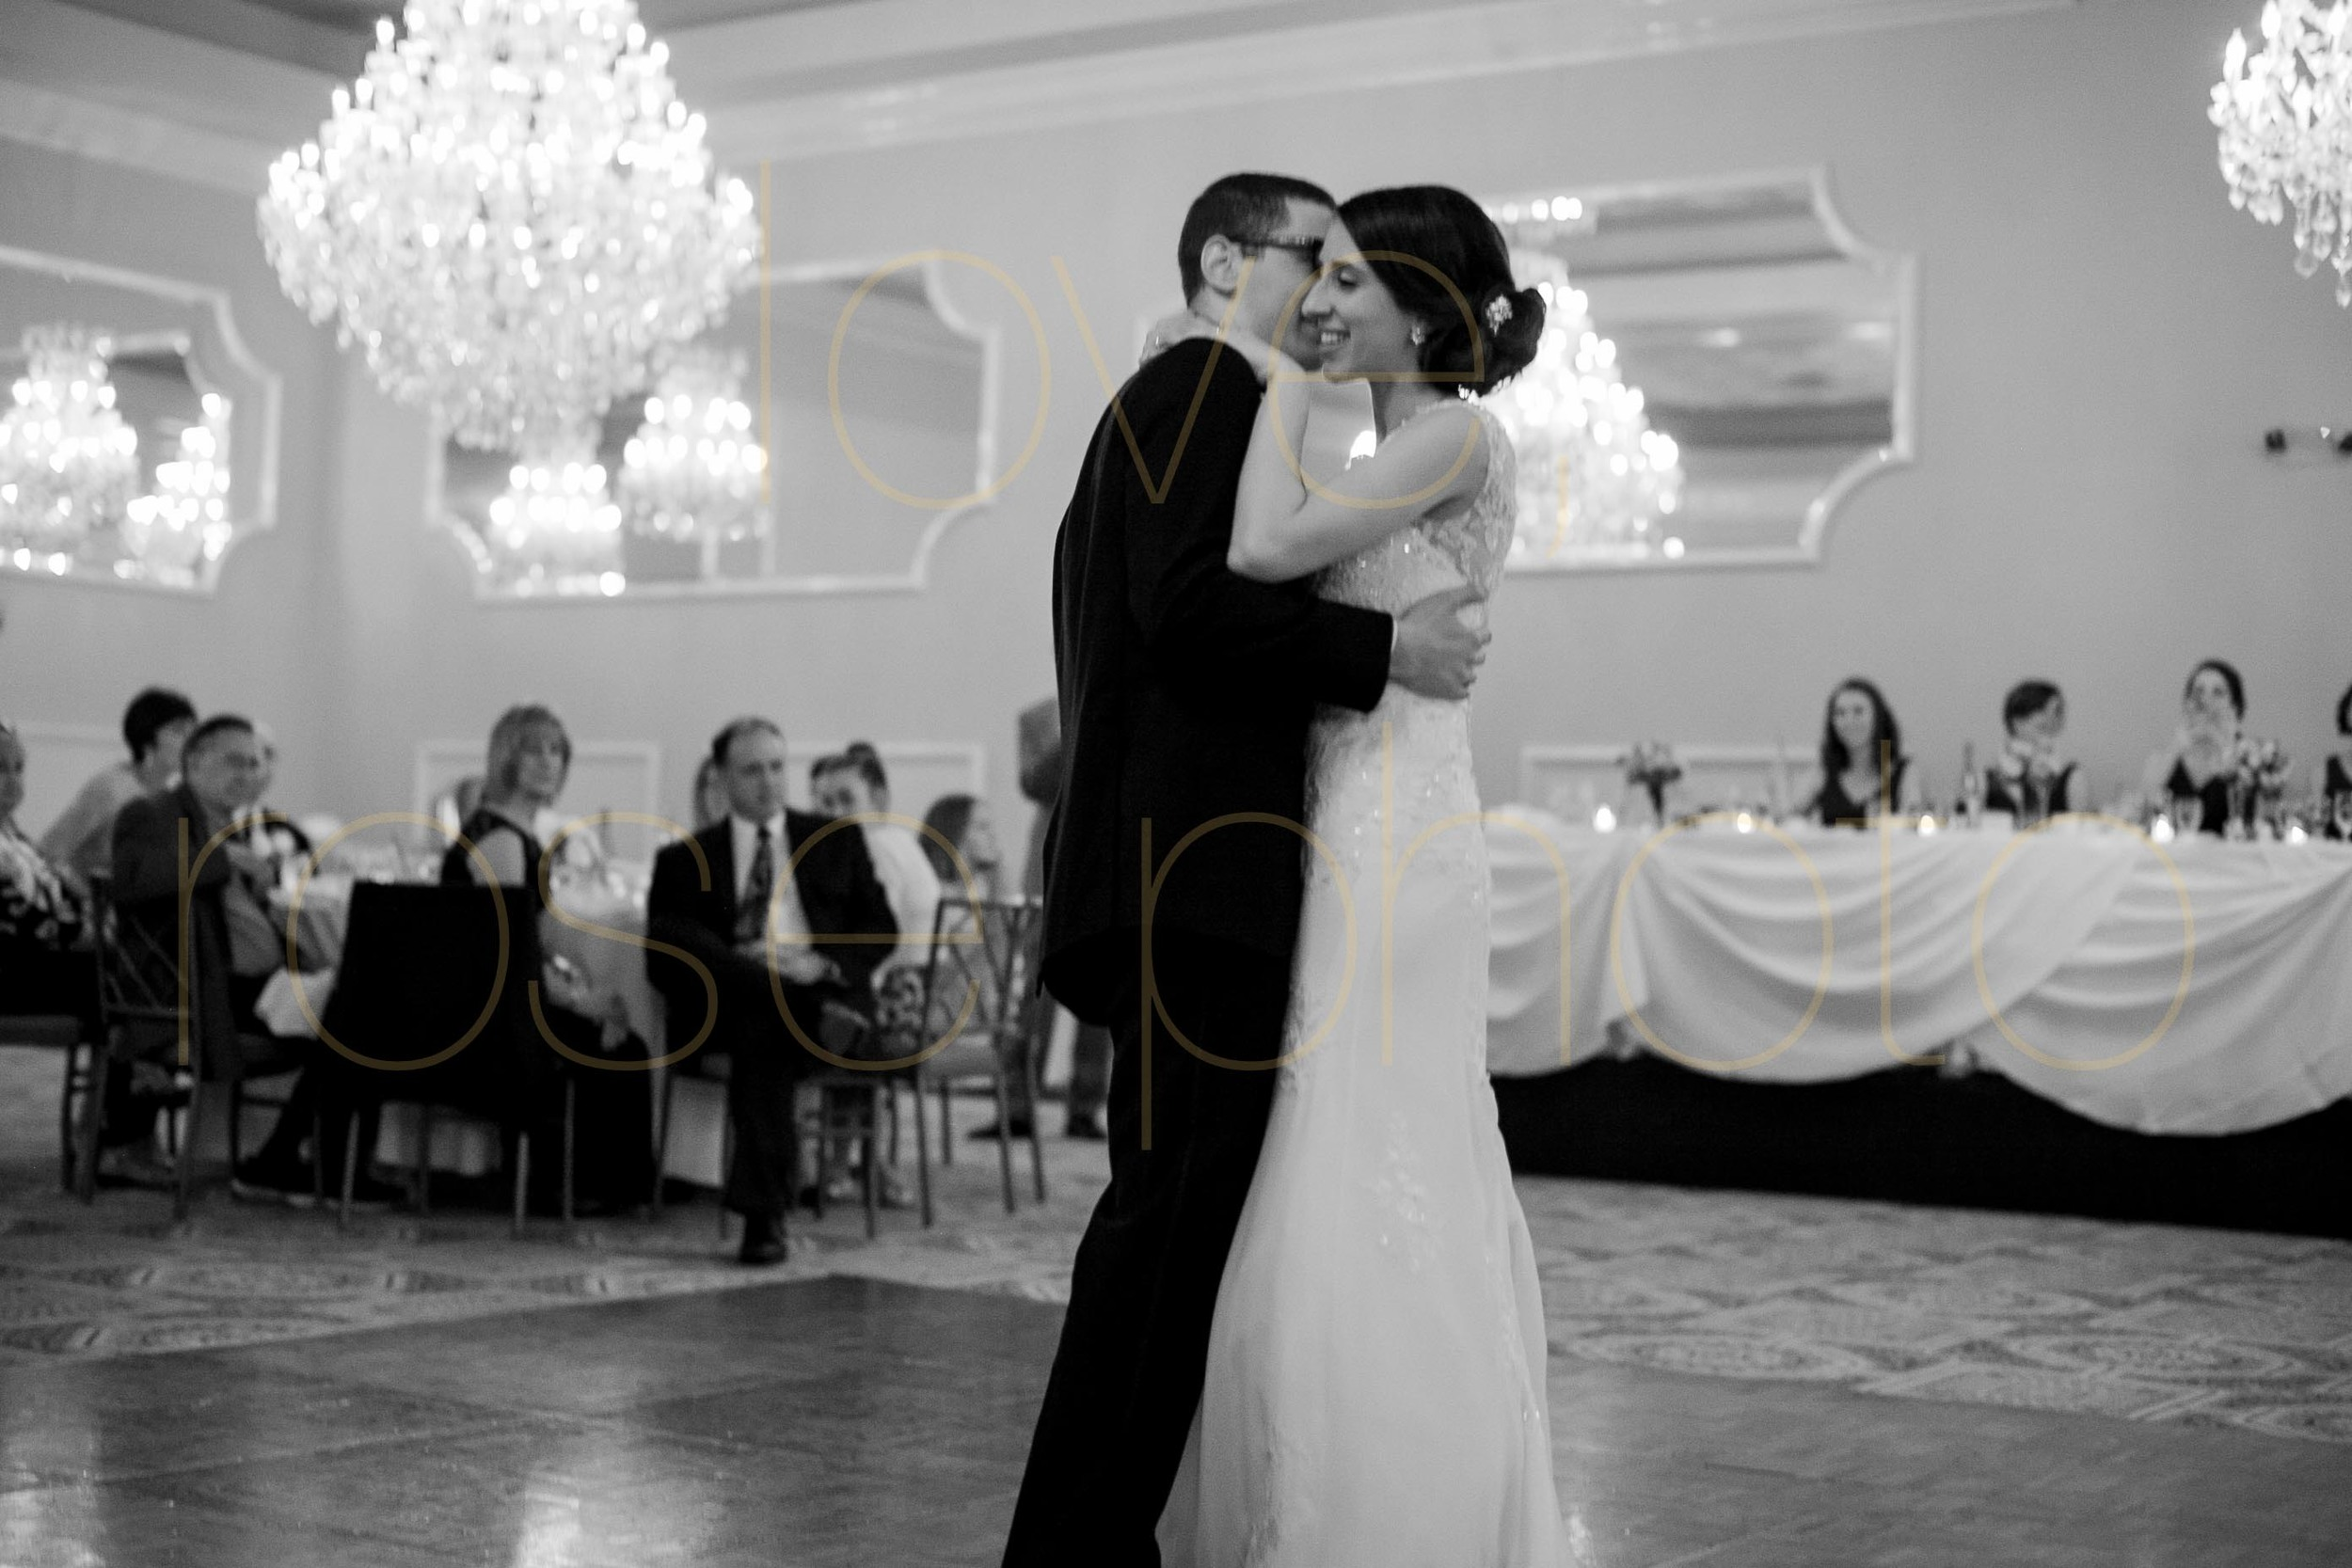 K Bianci maple chaple summer wedding chicago photographer -0398.jpg